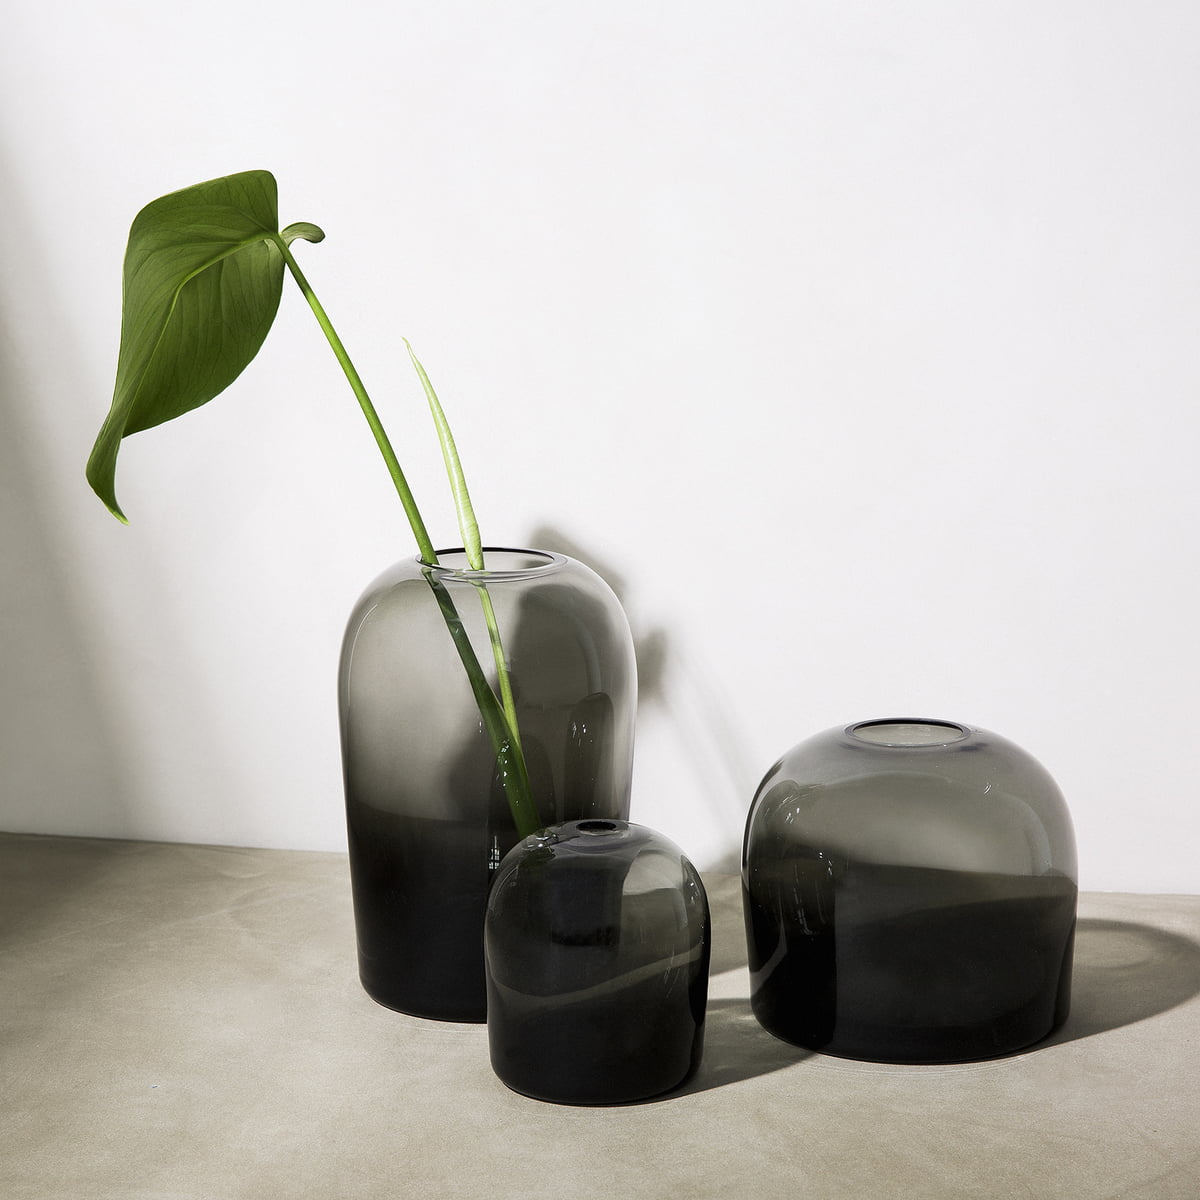 Nytt Troll Vase by Menu | Connox Shop GR-38